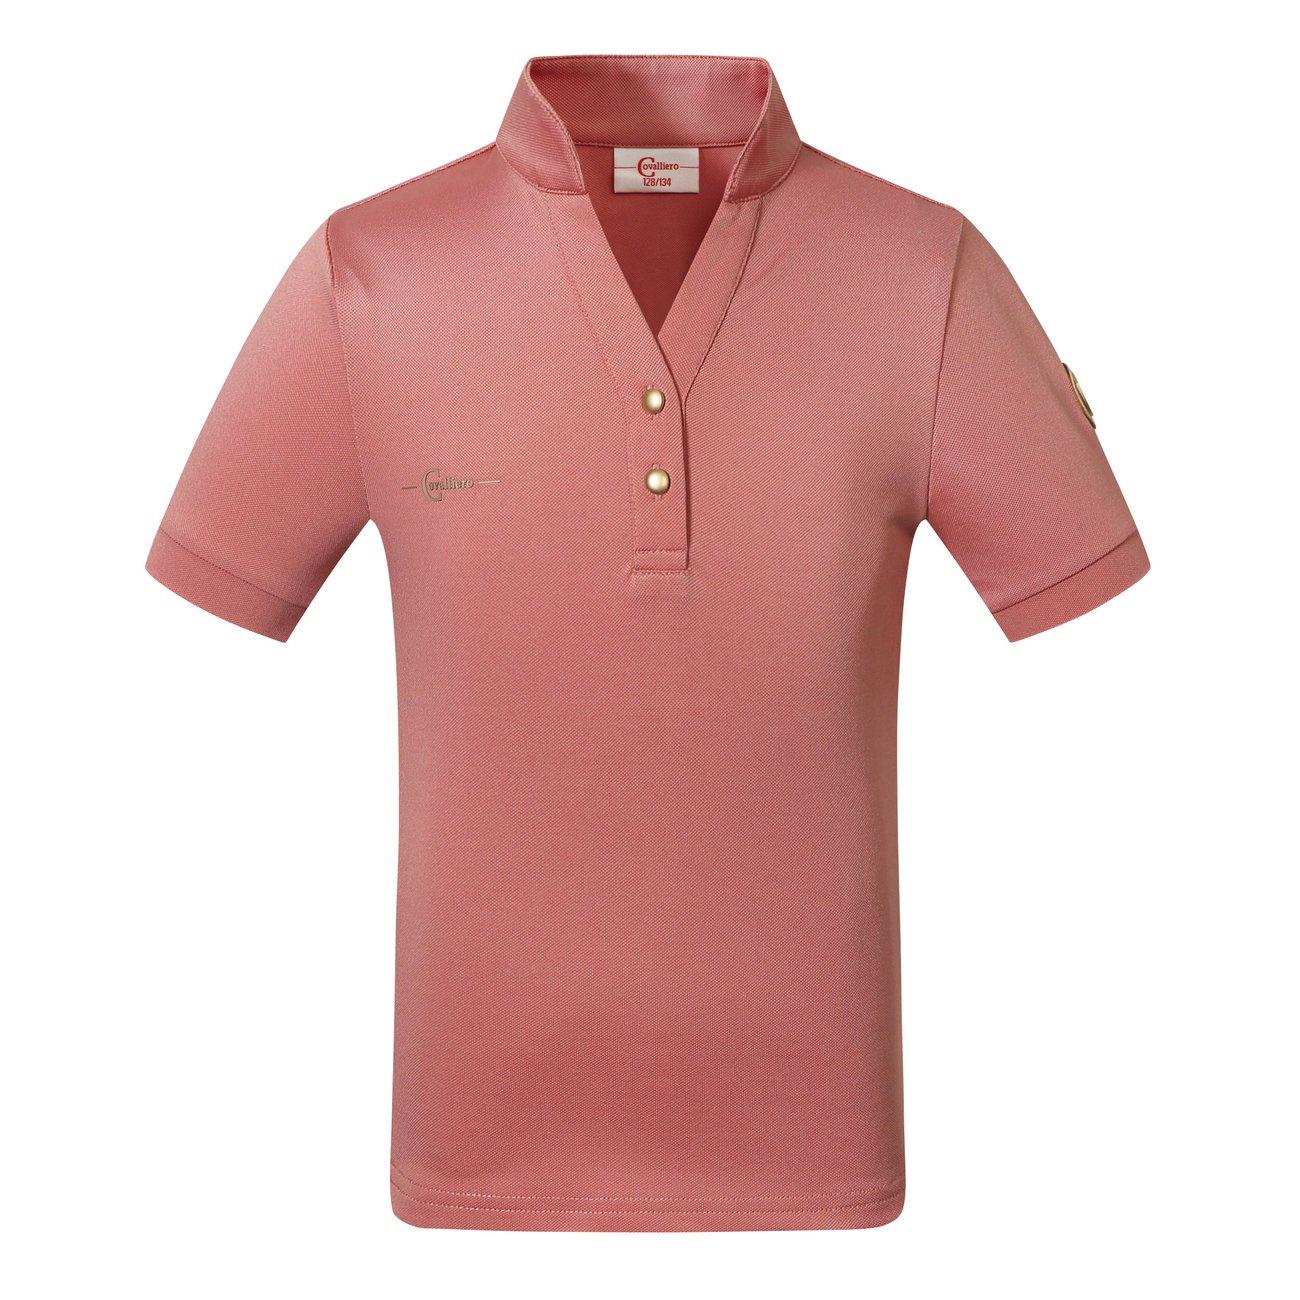 Kerbl Kinder Poloshirt Trendy, Gr. 164/170, rose